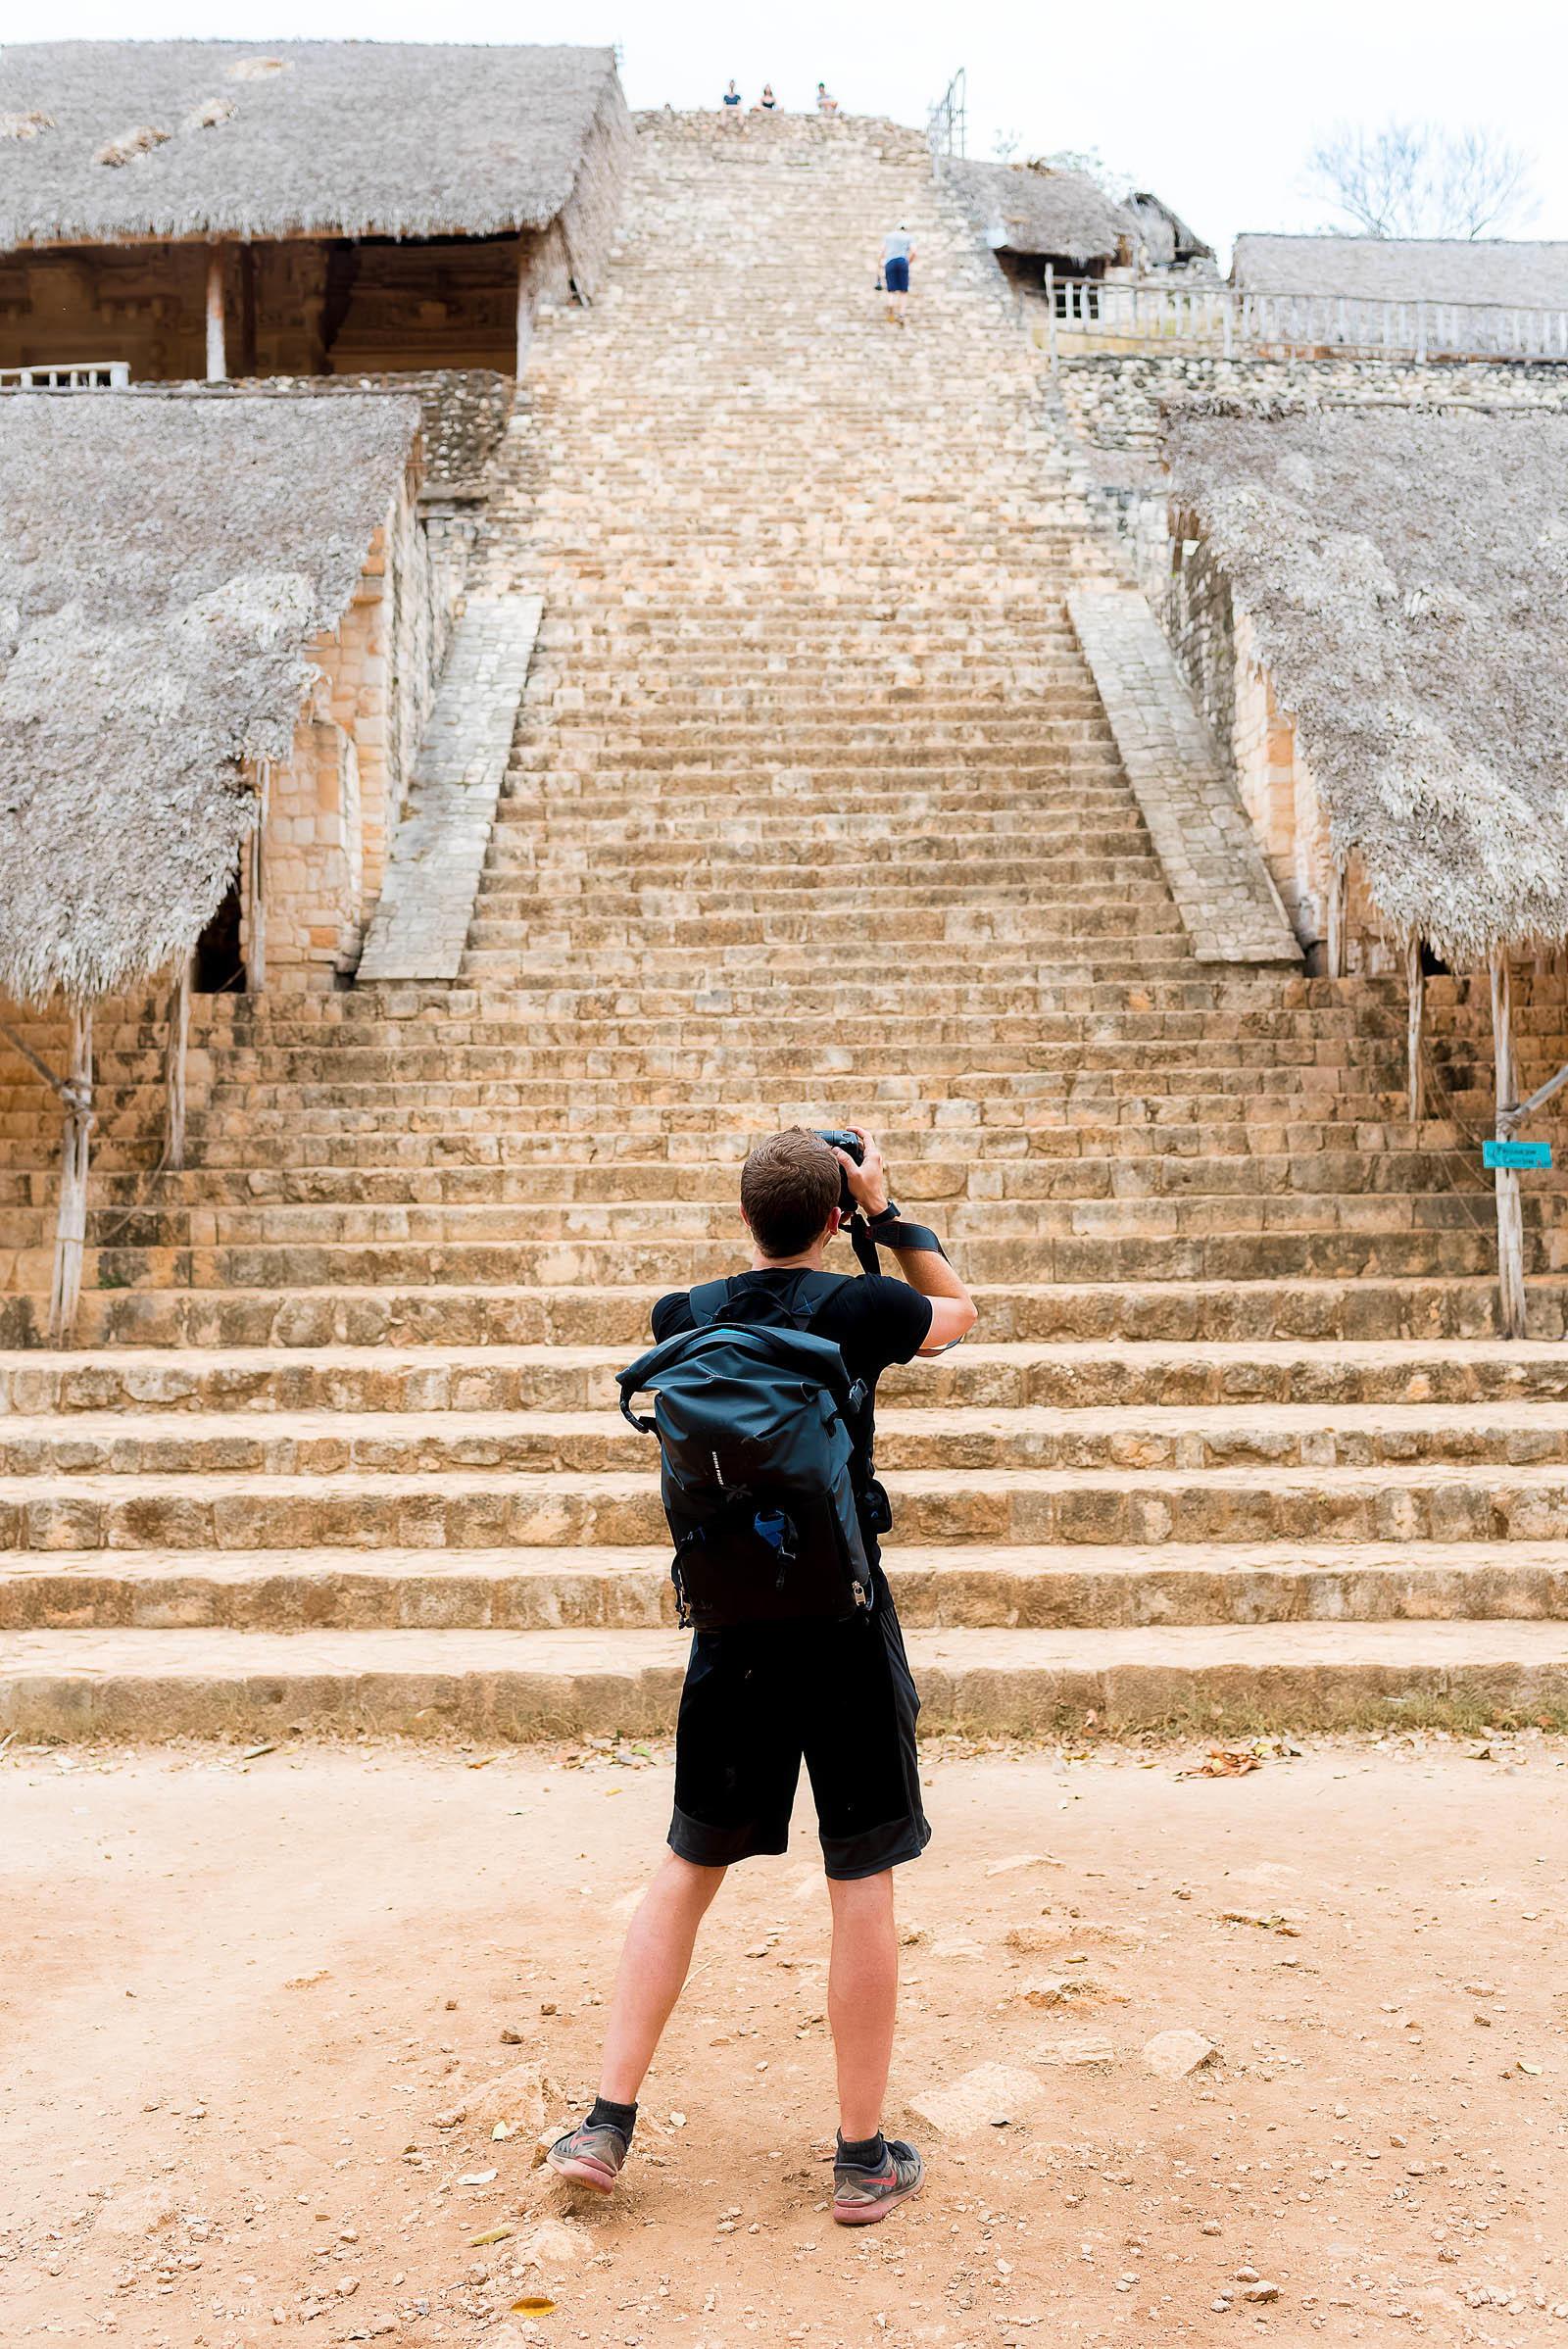 Ek Balam Mayan Archaeological Site and Mayan Cenote, Yucatán Mexico